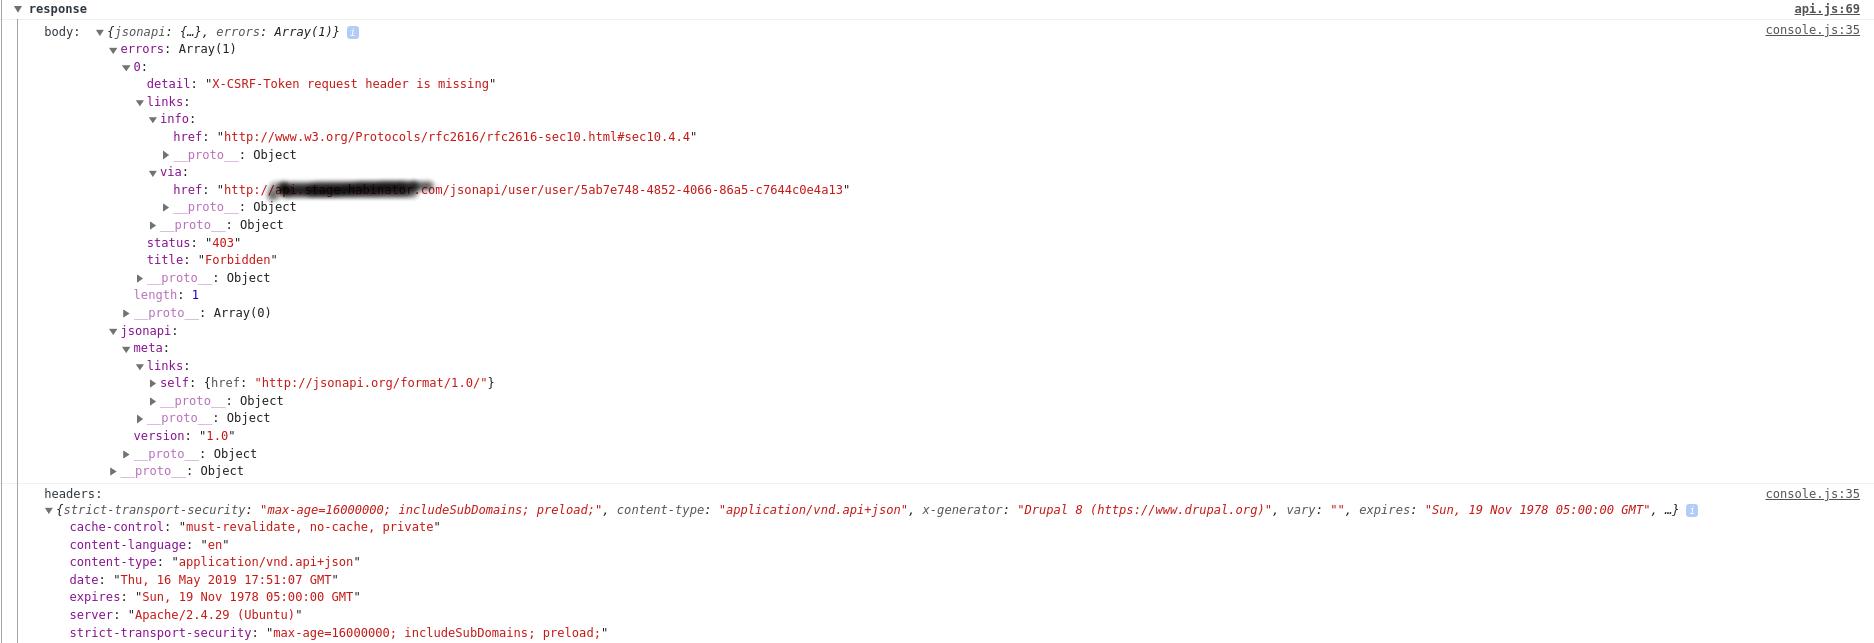 X-CSRF-Token request header is missing when using Bearer